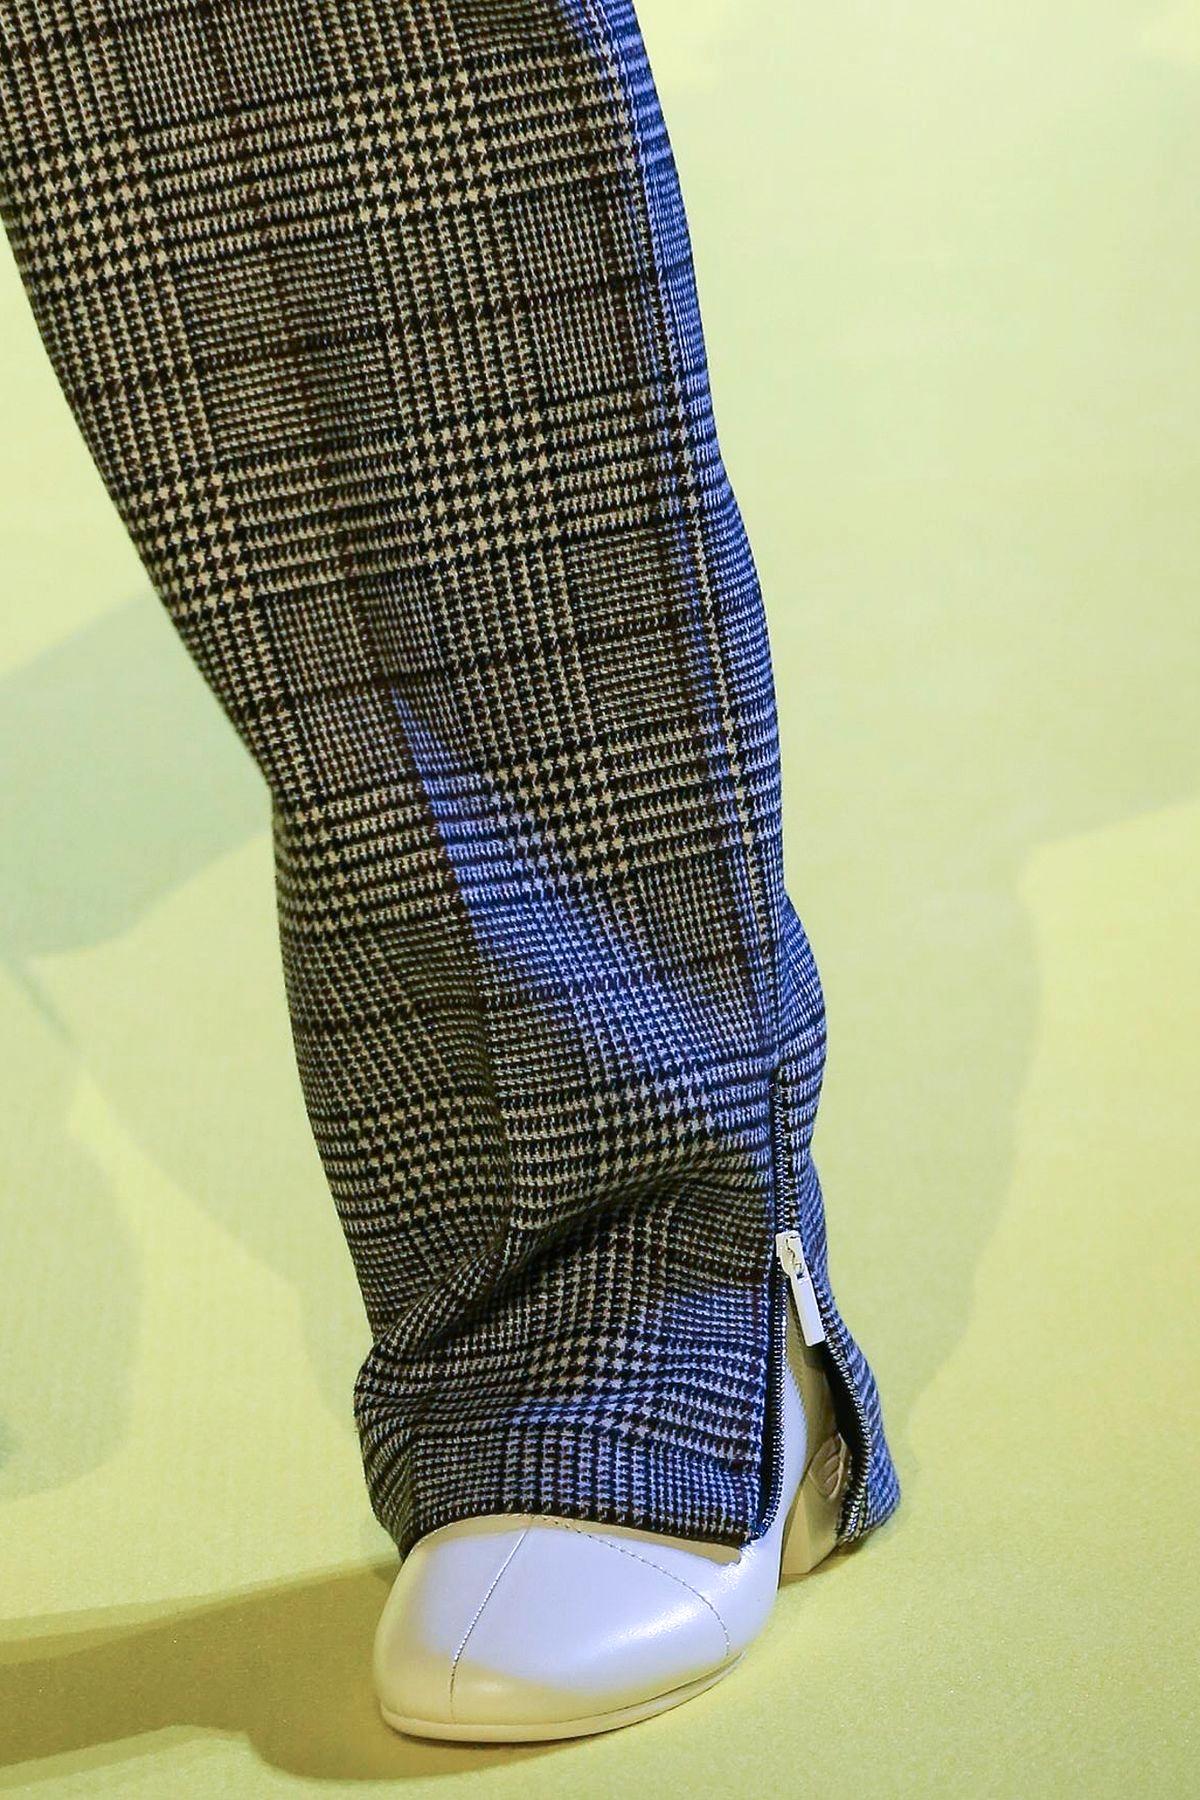 Raf Simons Fall/Winter 2020 Menswear